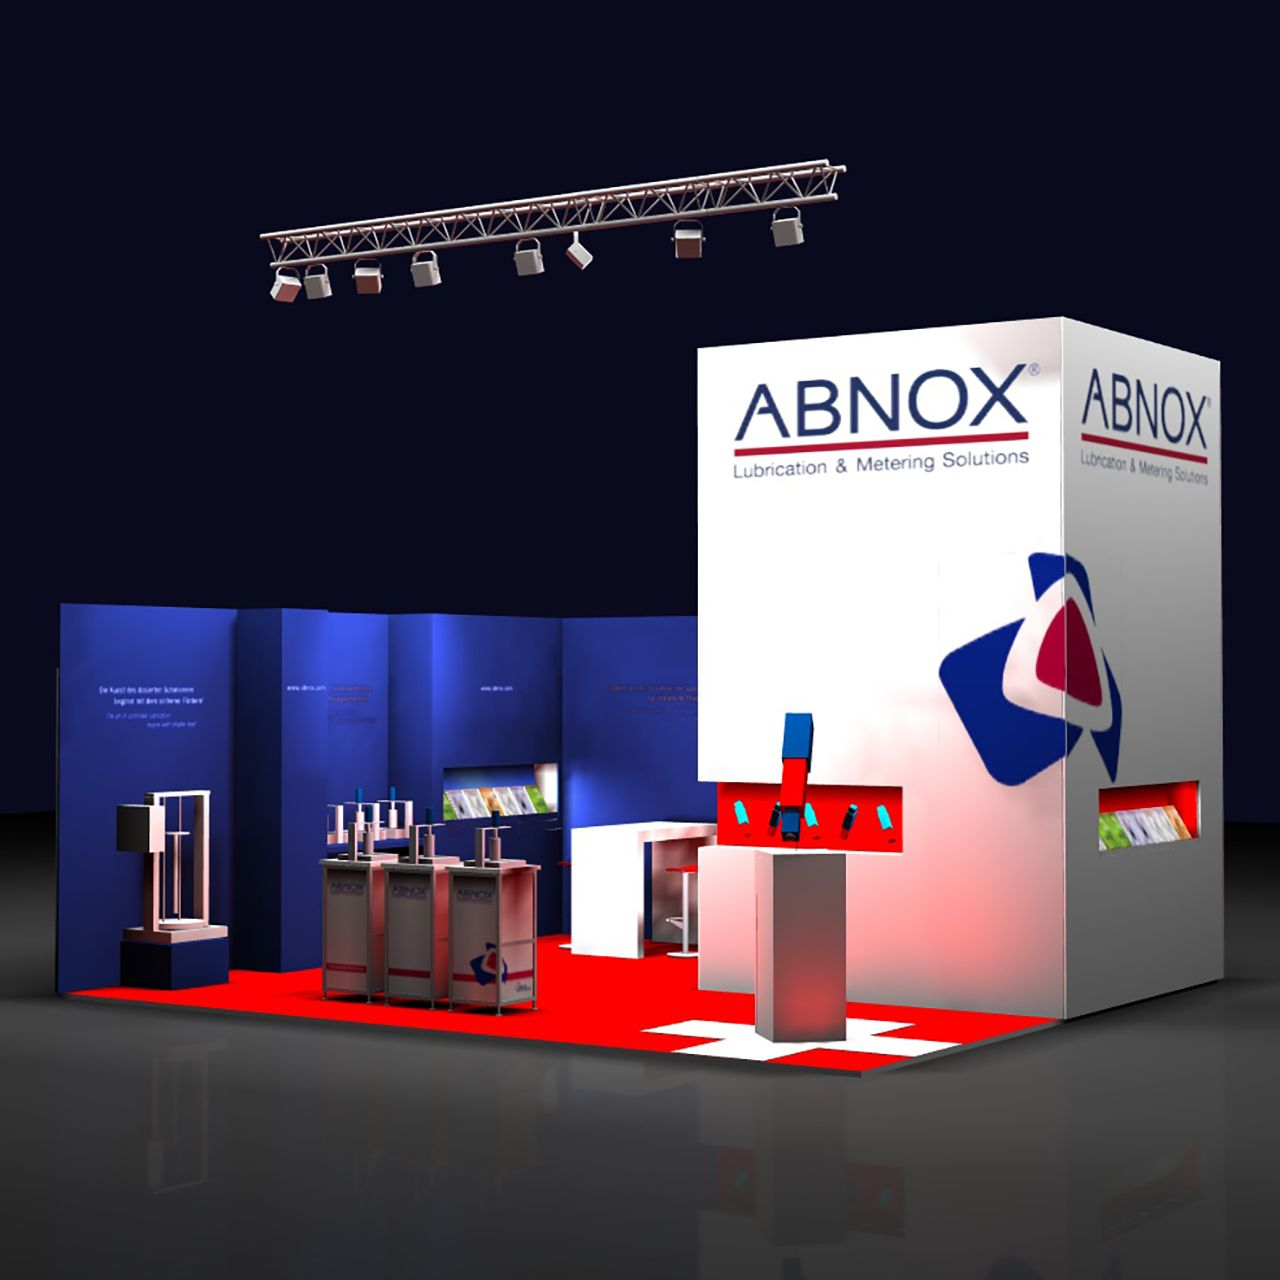 ABNOX AG